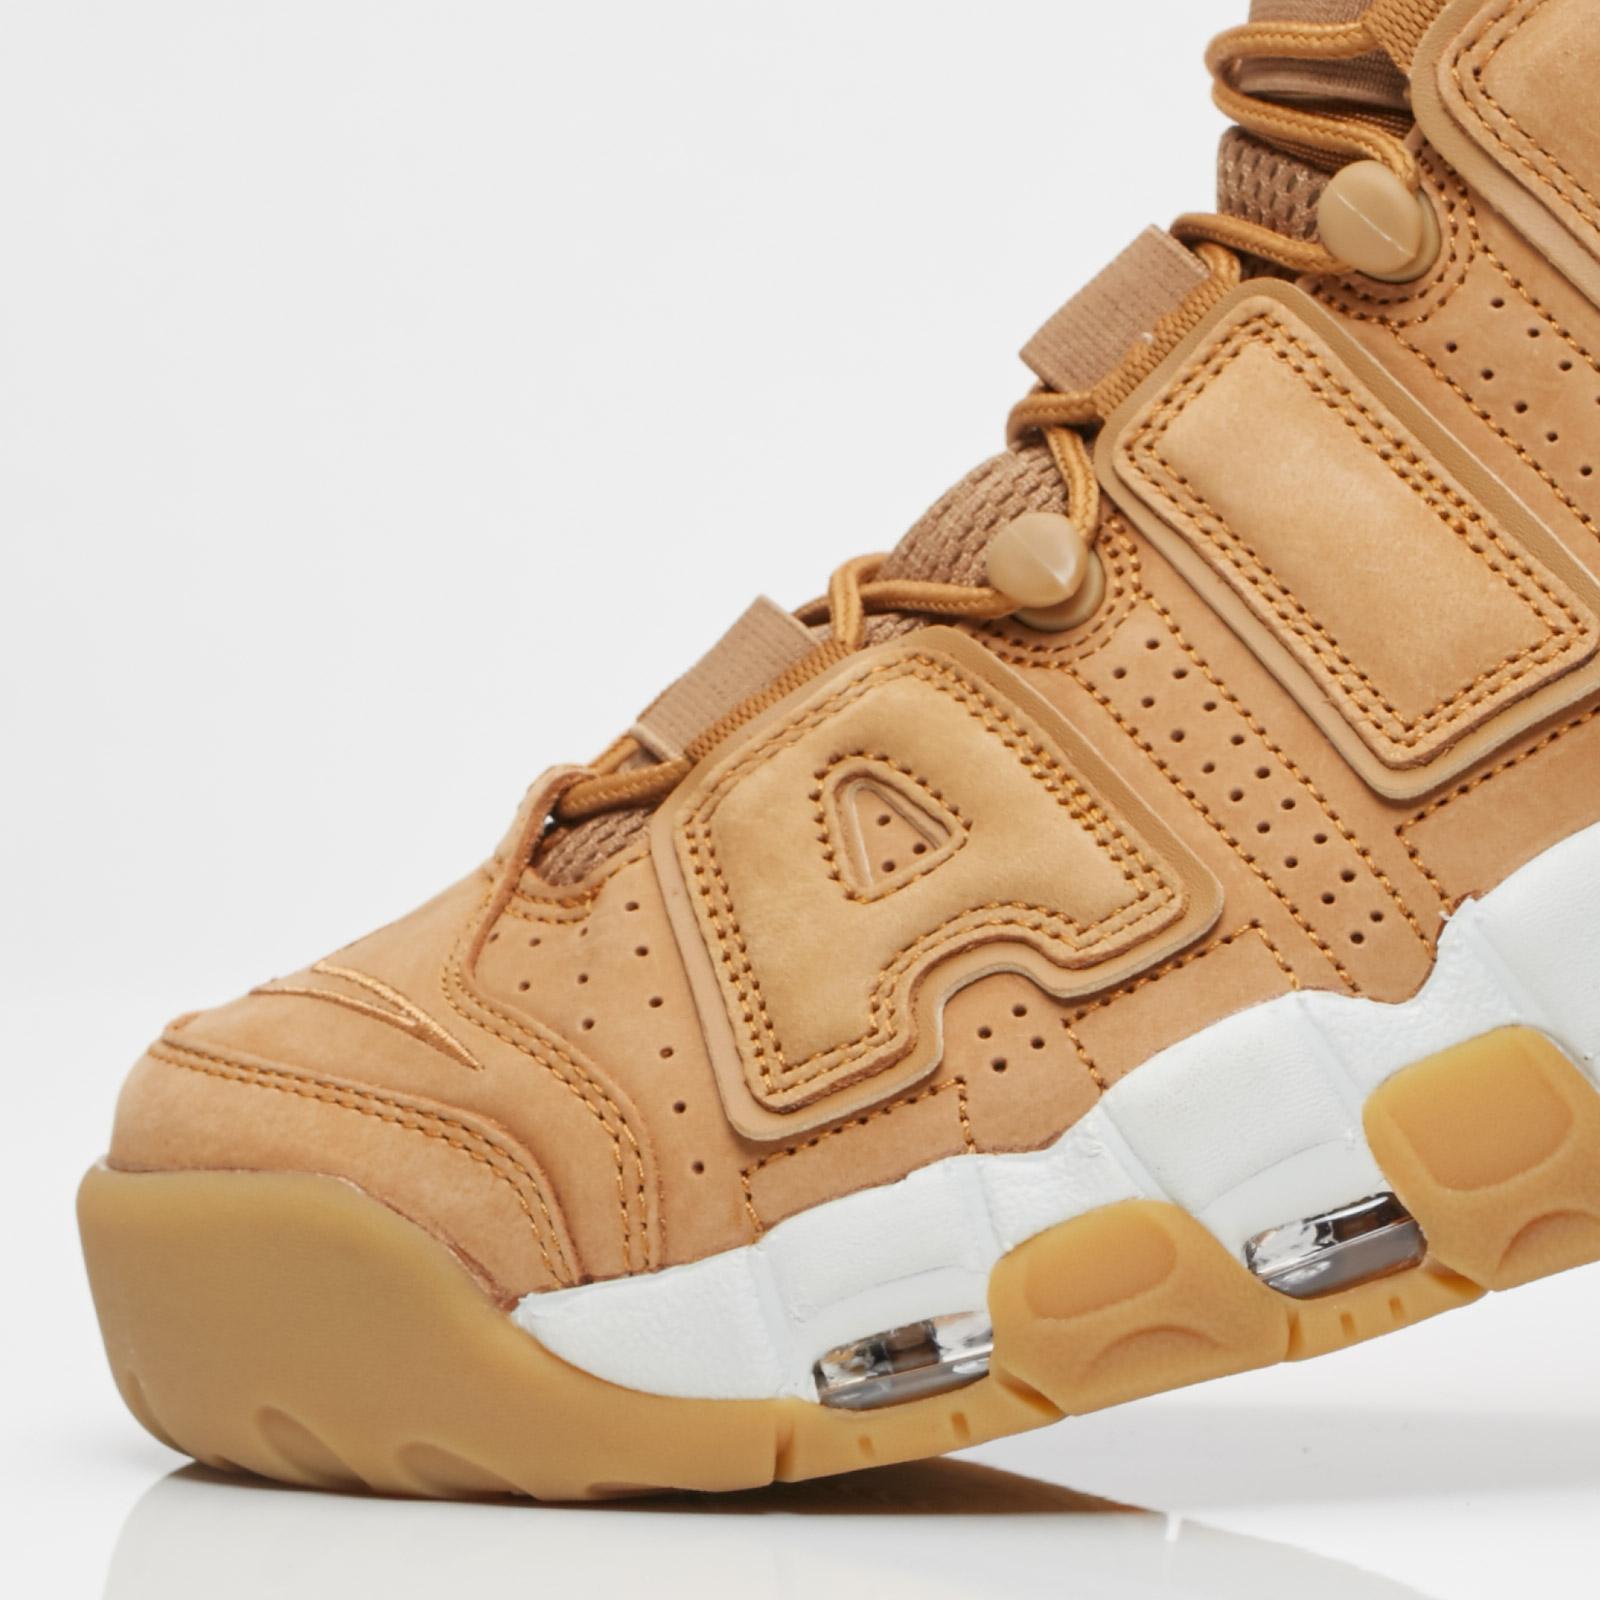 Nike Air More Uptempo 96 Premium - Aa4060-200 - Sneakersnstuff ... 951ef0530